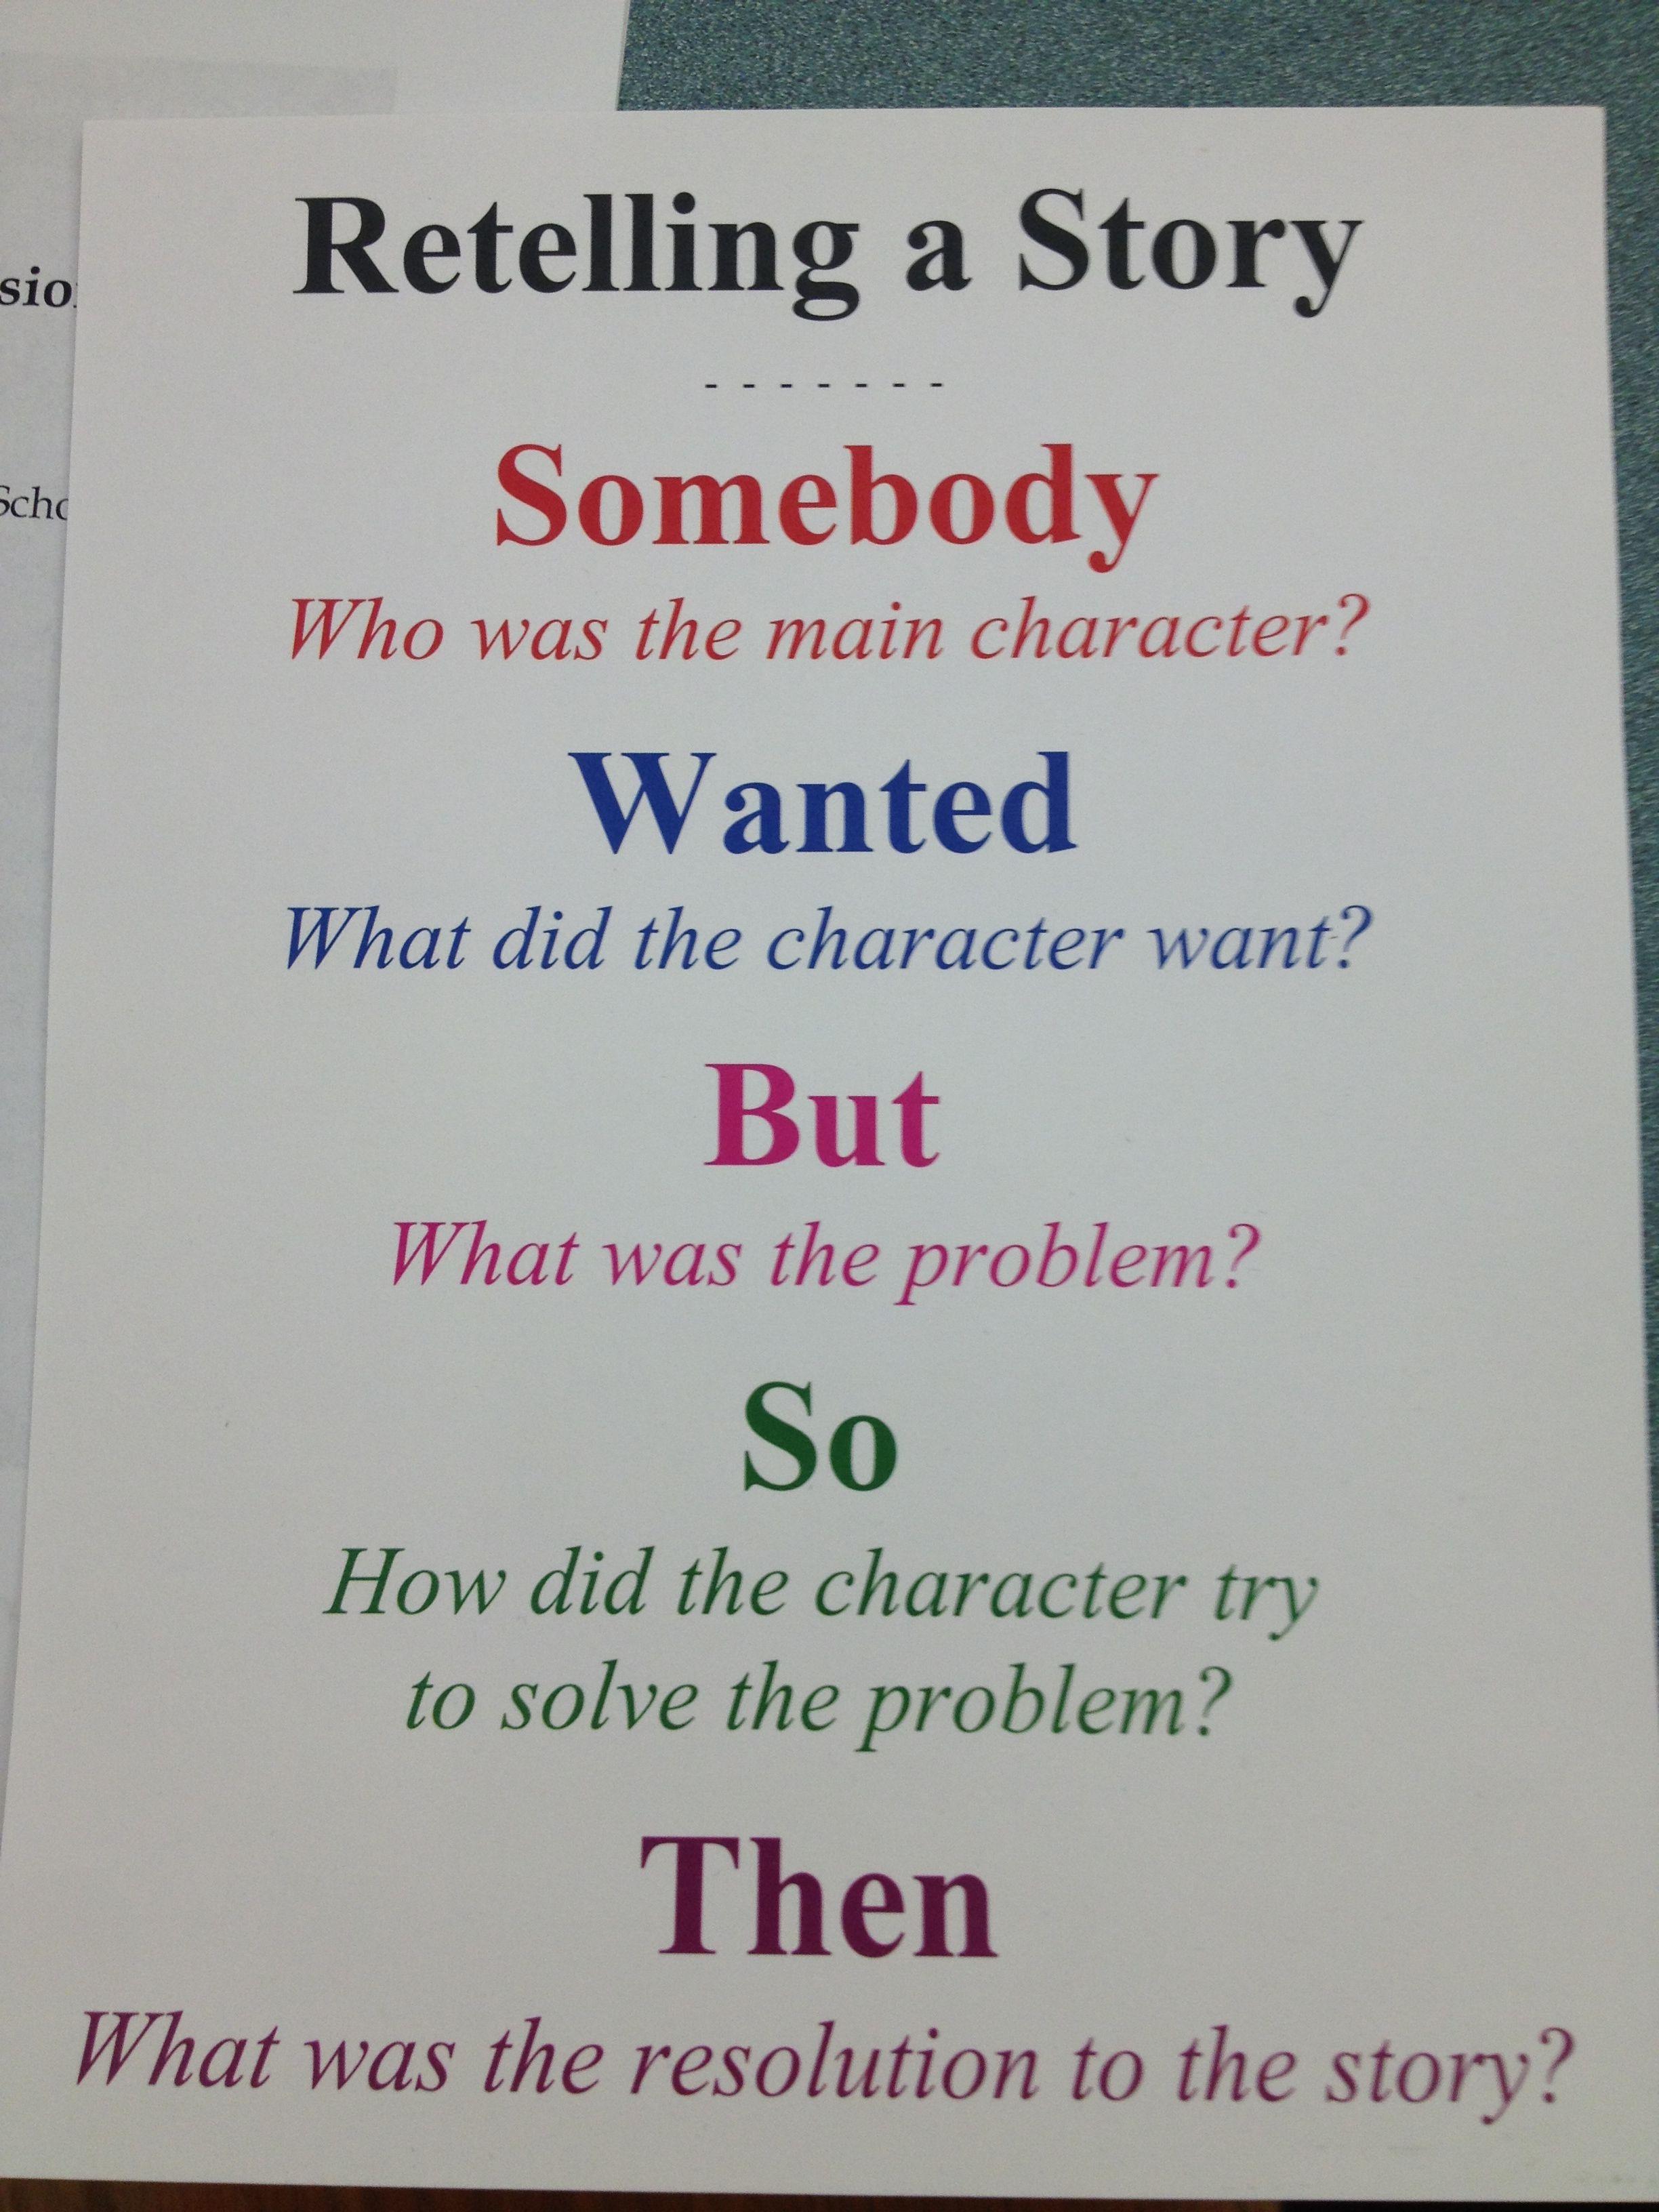 Story Retelling In 1 2 Sentences